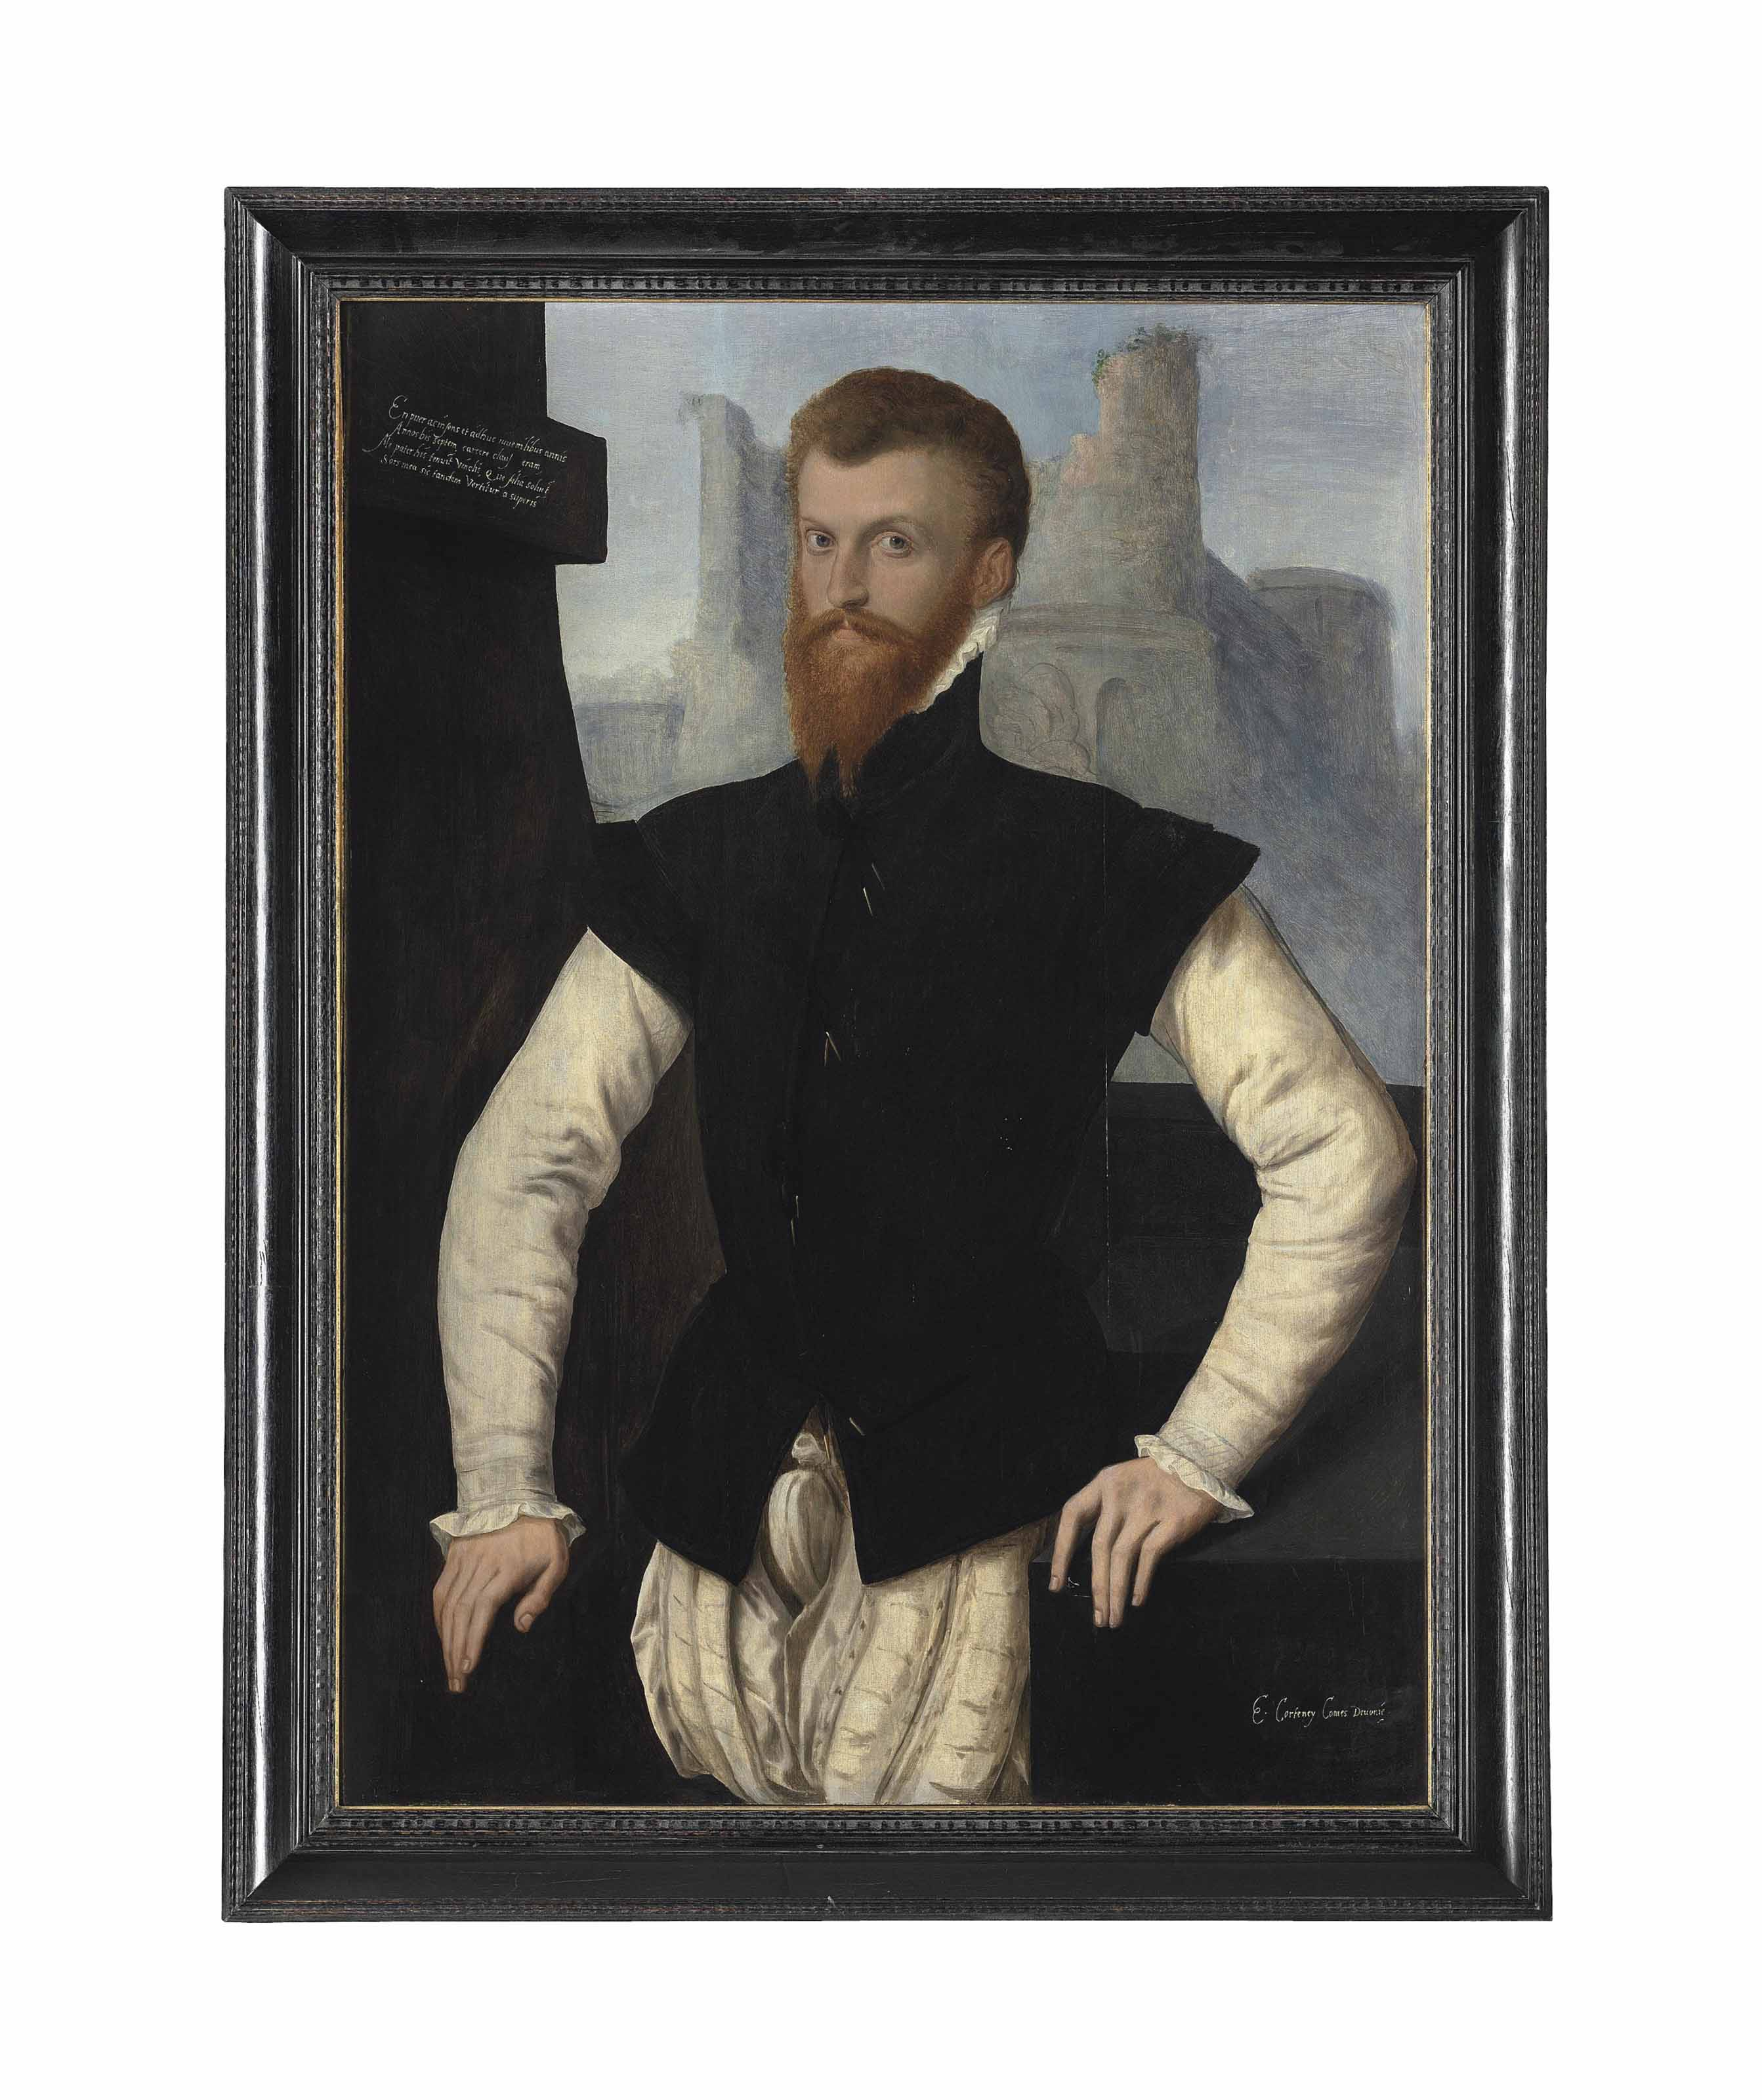 Audio: Portrait of Edward Courtenay, 1st Earl of Devon (1523-1556)